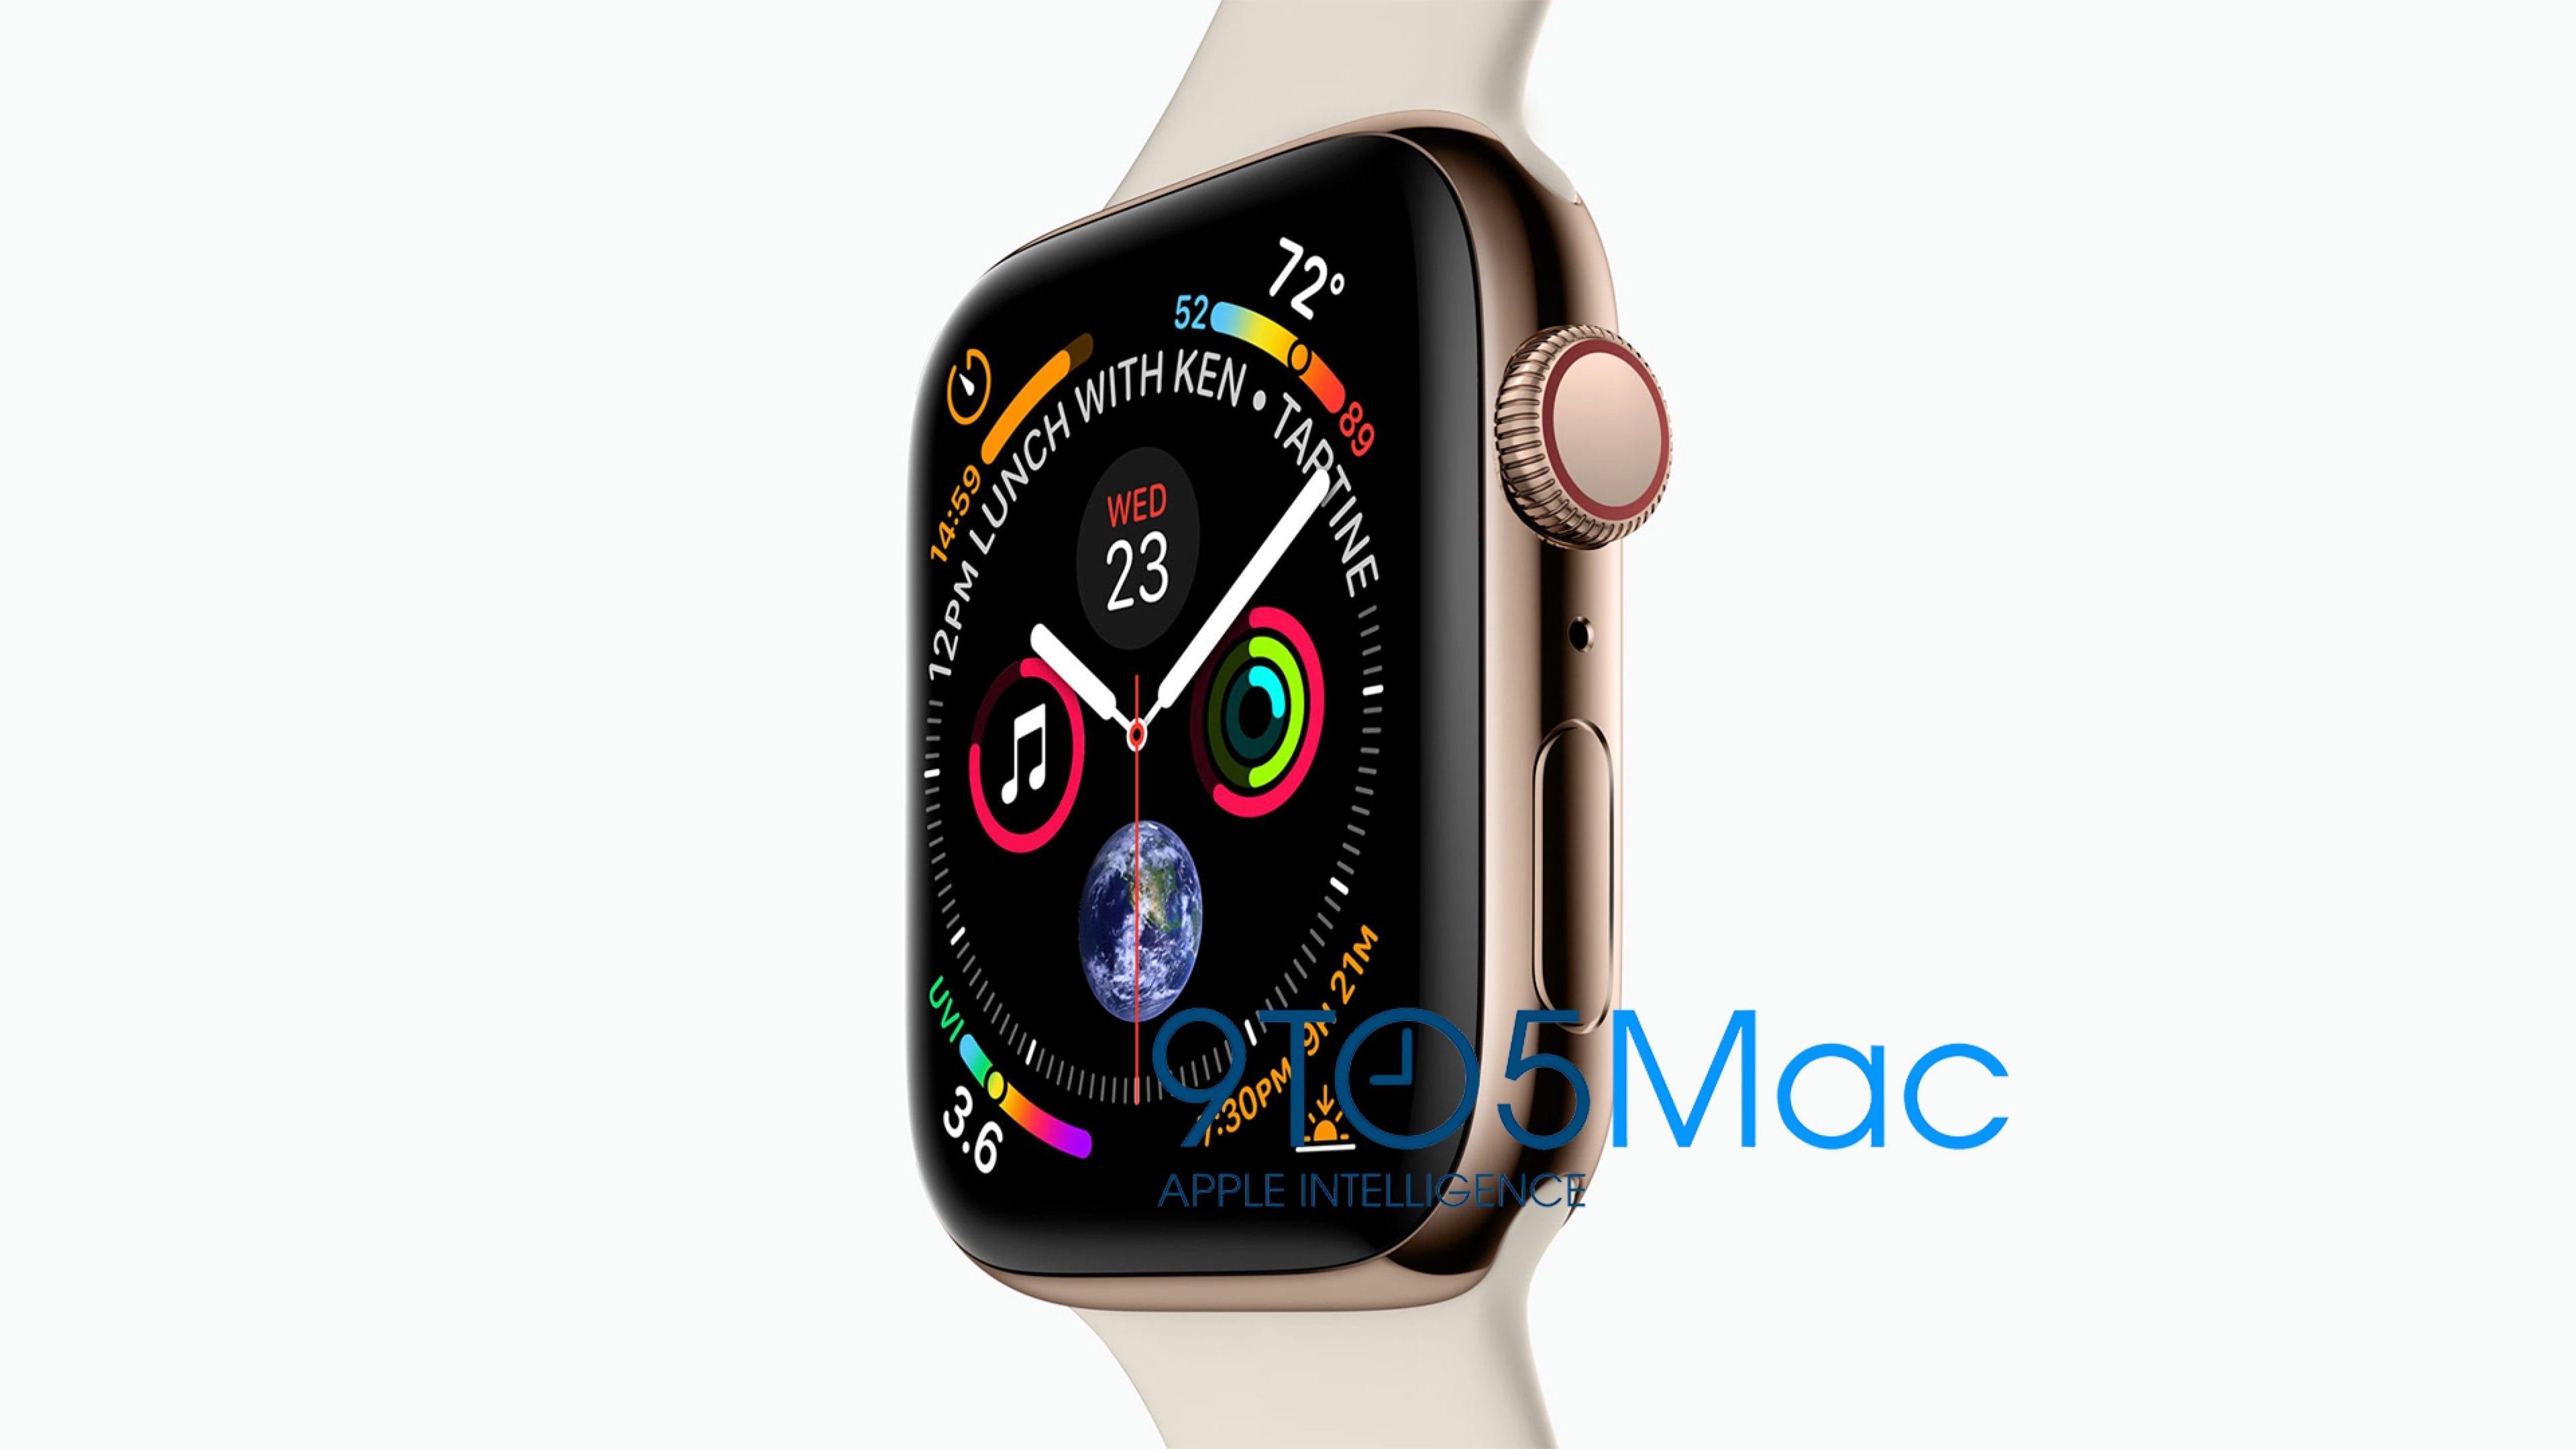 Apple Watch Series 4 9to5mac